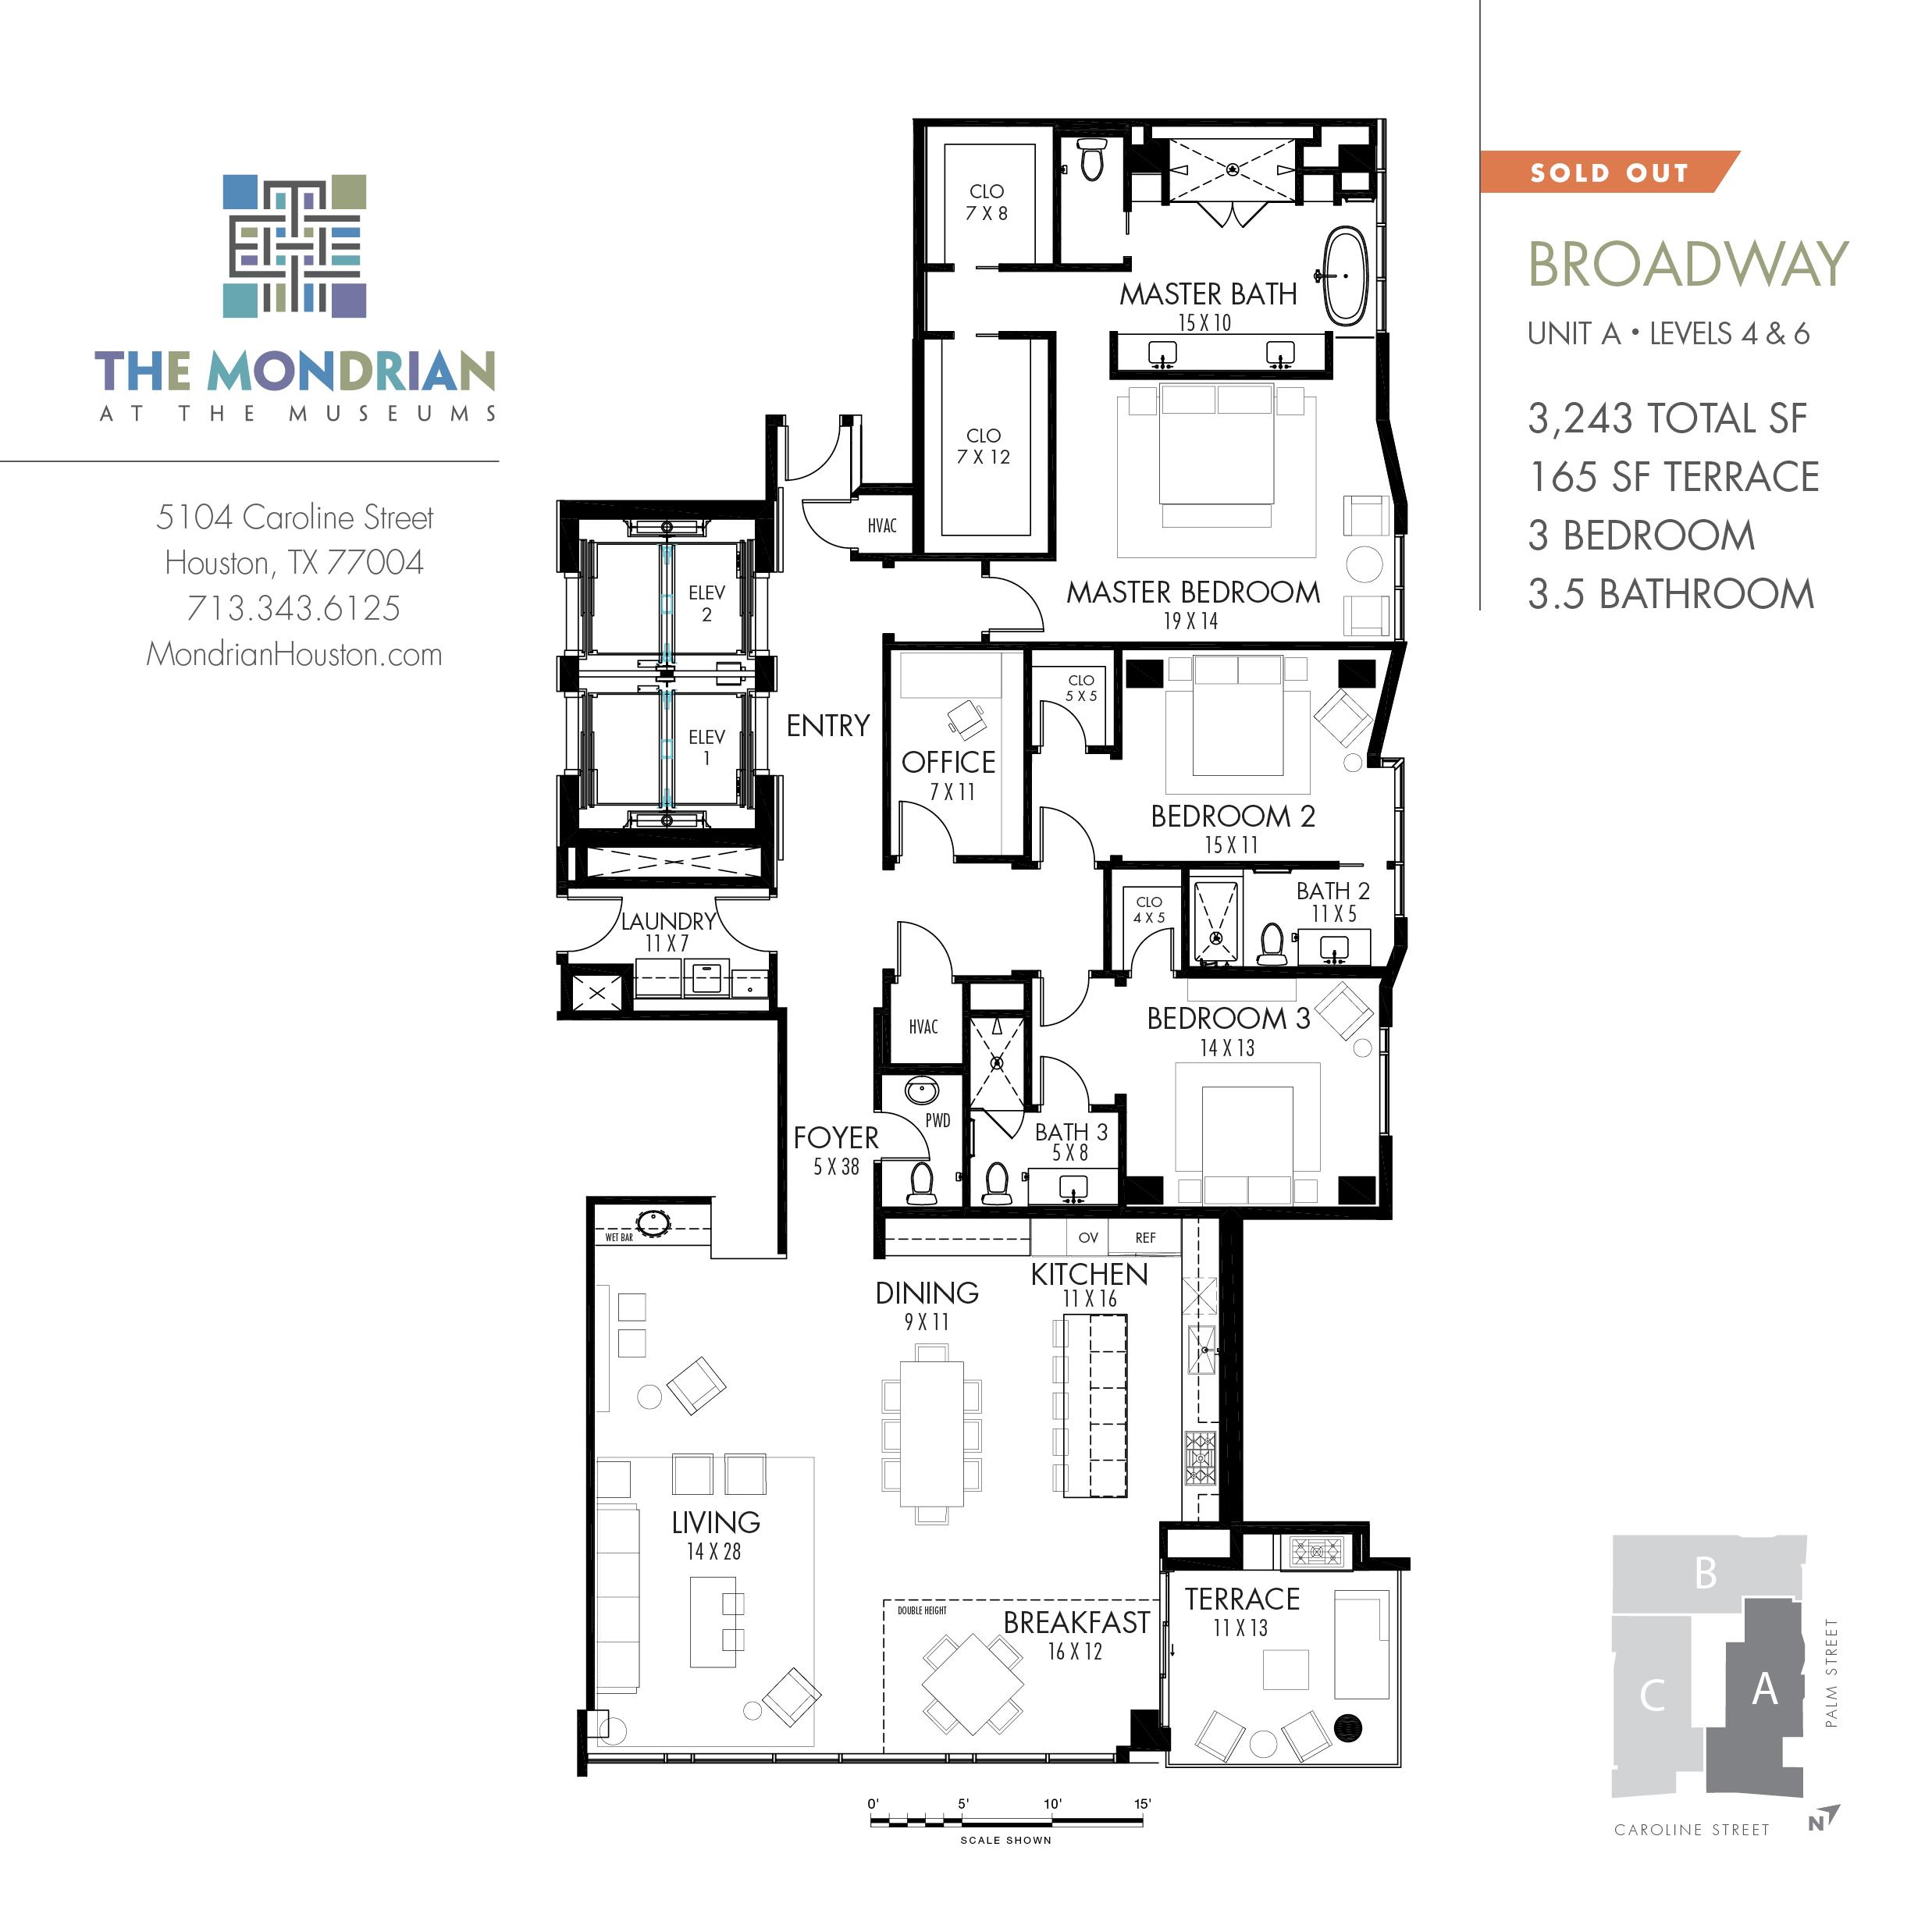 Mondrian-Broadway-SoldOut.jpg